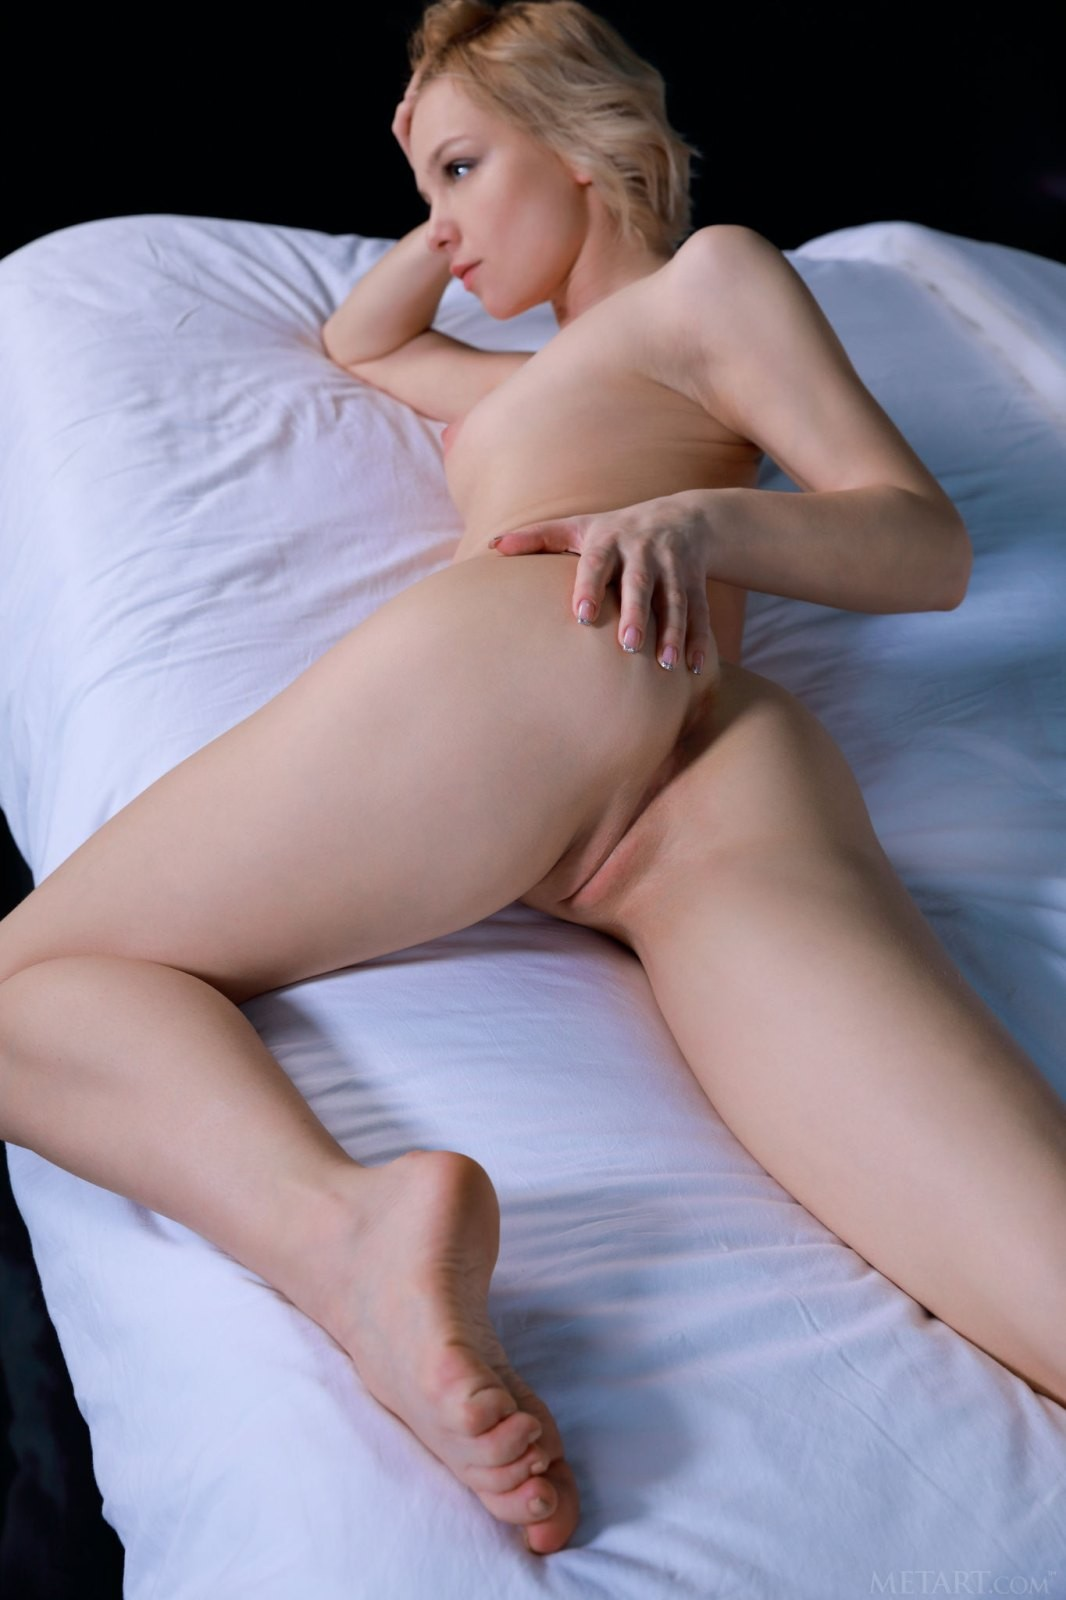 Тощая блондинка раздвигает ножки - фото